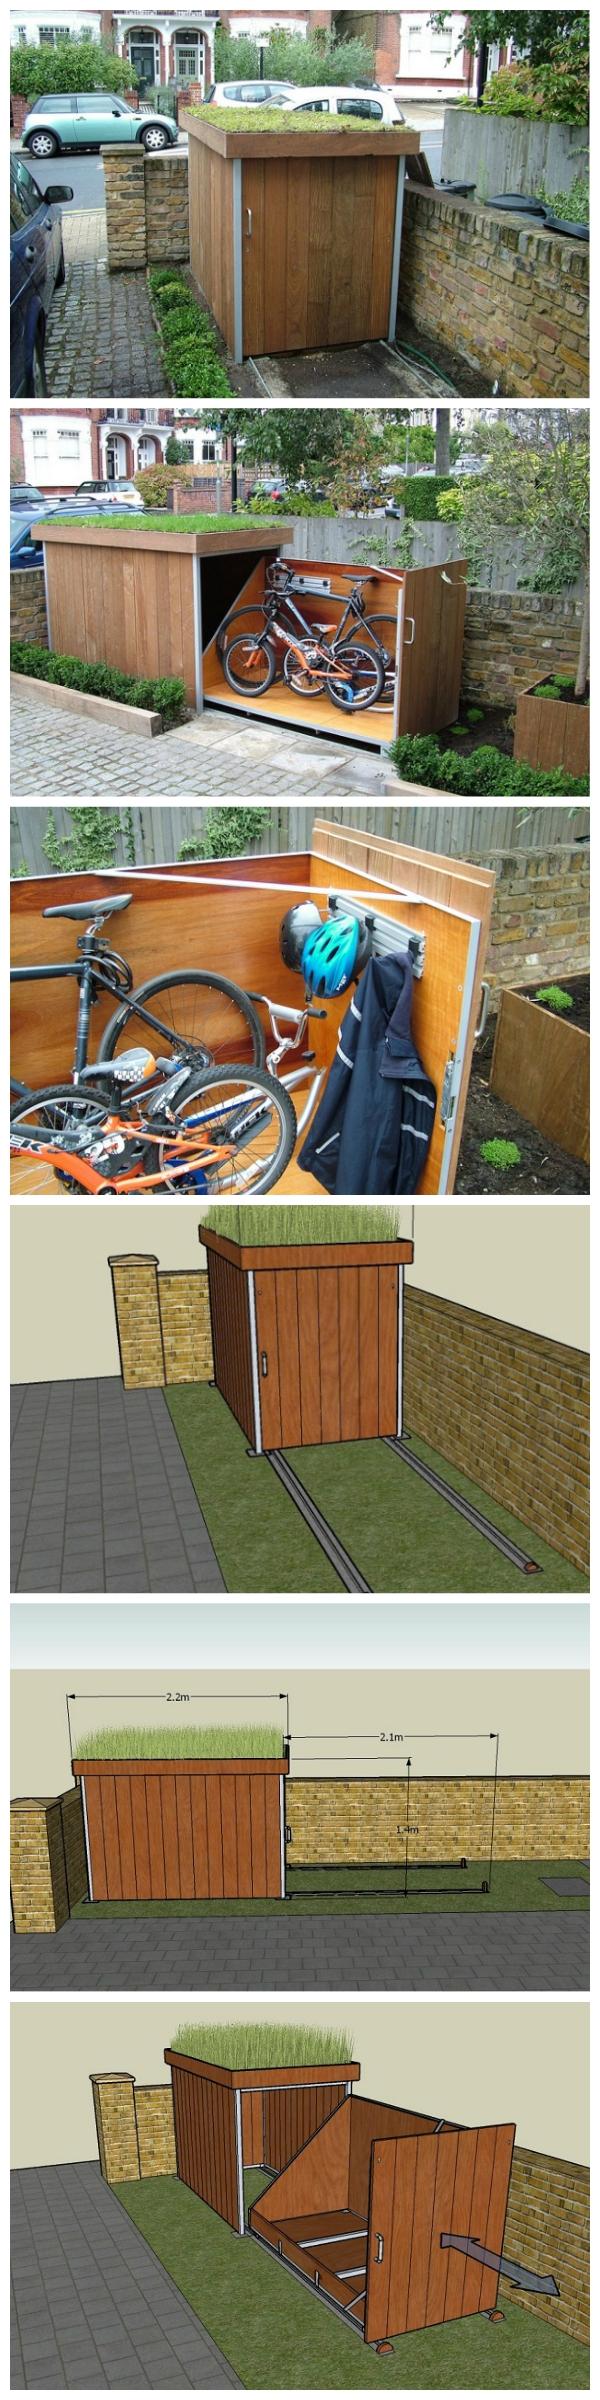 Backyard Shed DIY Ideas You Won't Believe - DIYBunker